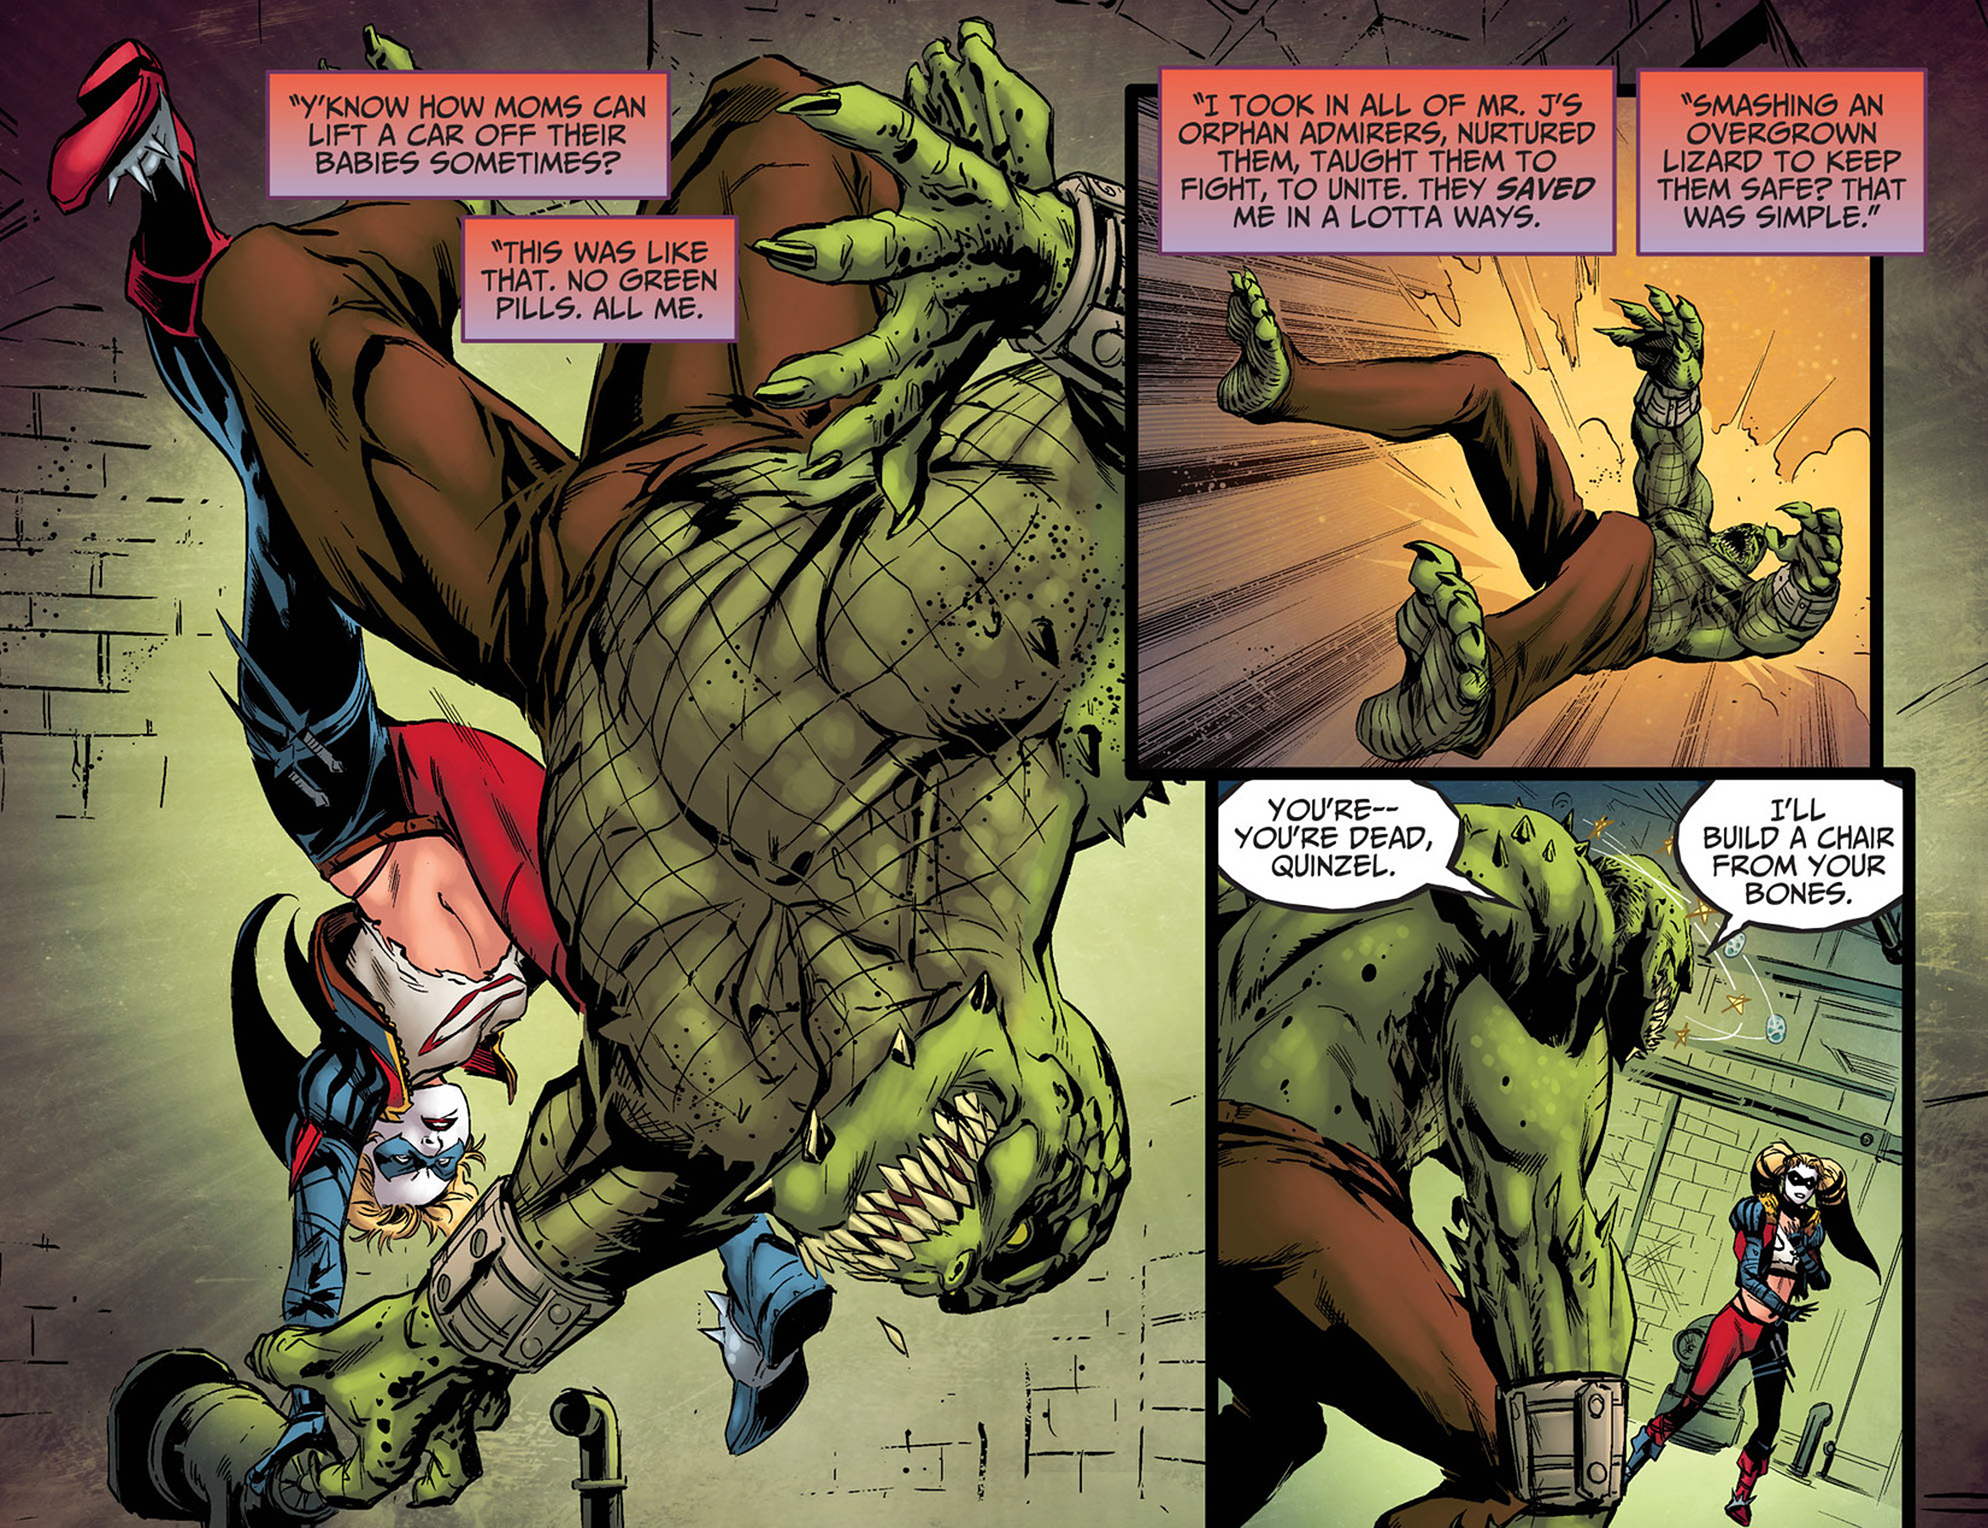 Read online Injustice: Ground Zero comic -  Issue #8 - 12